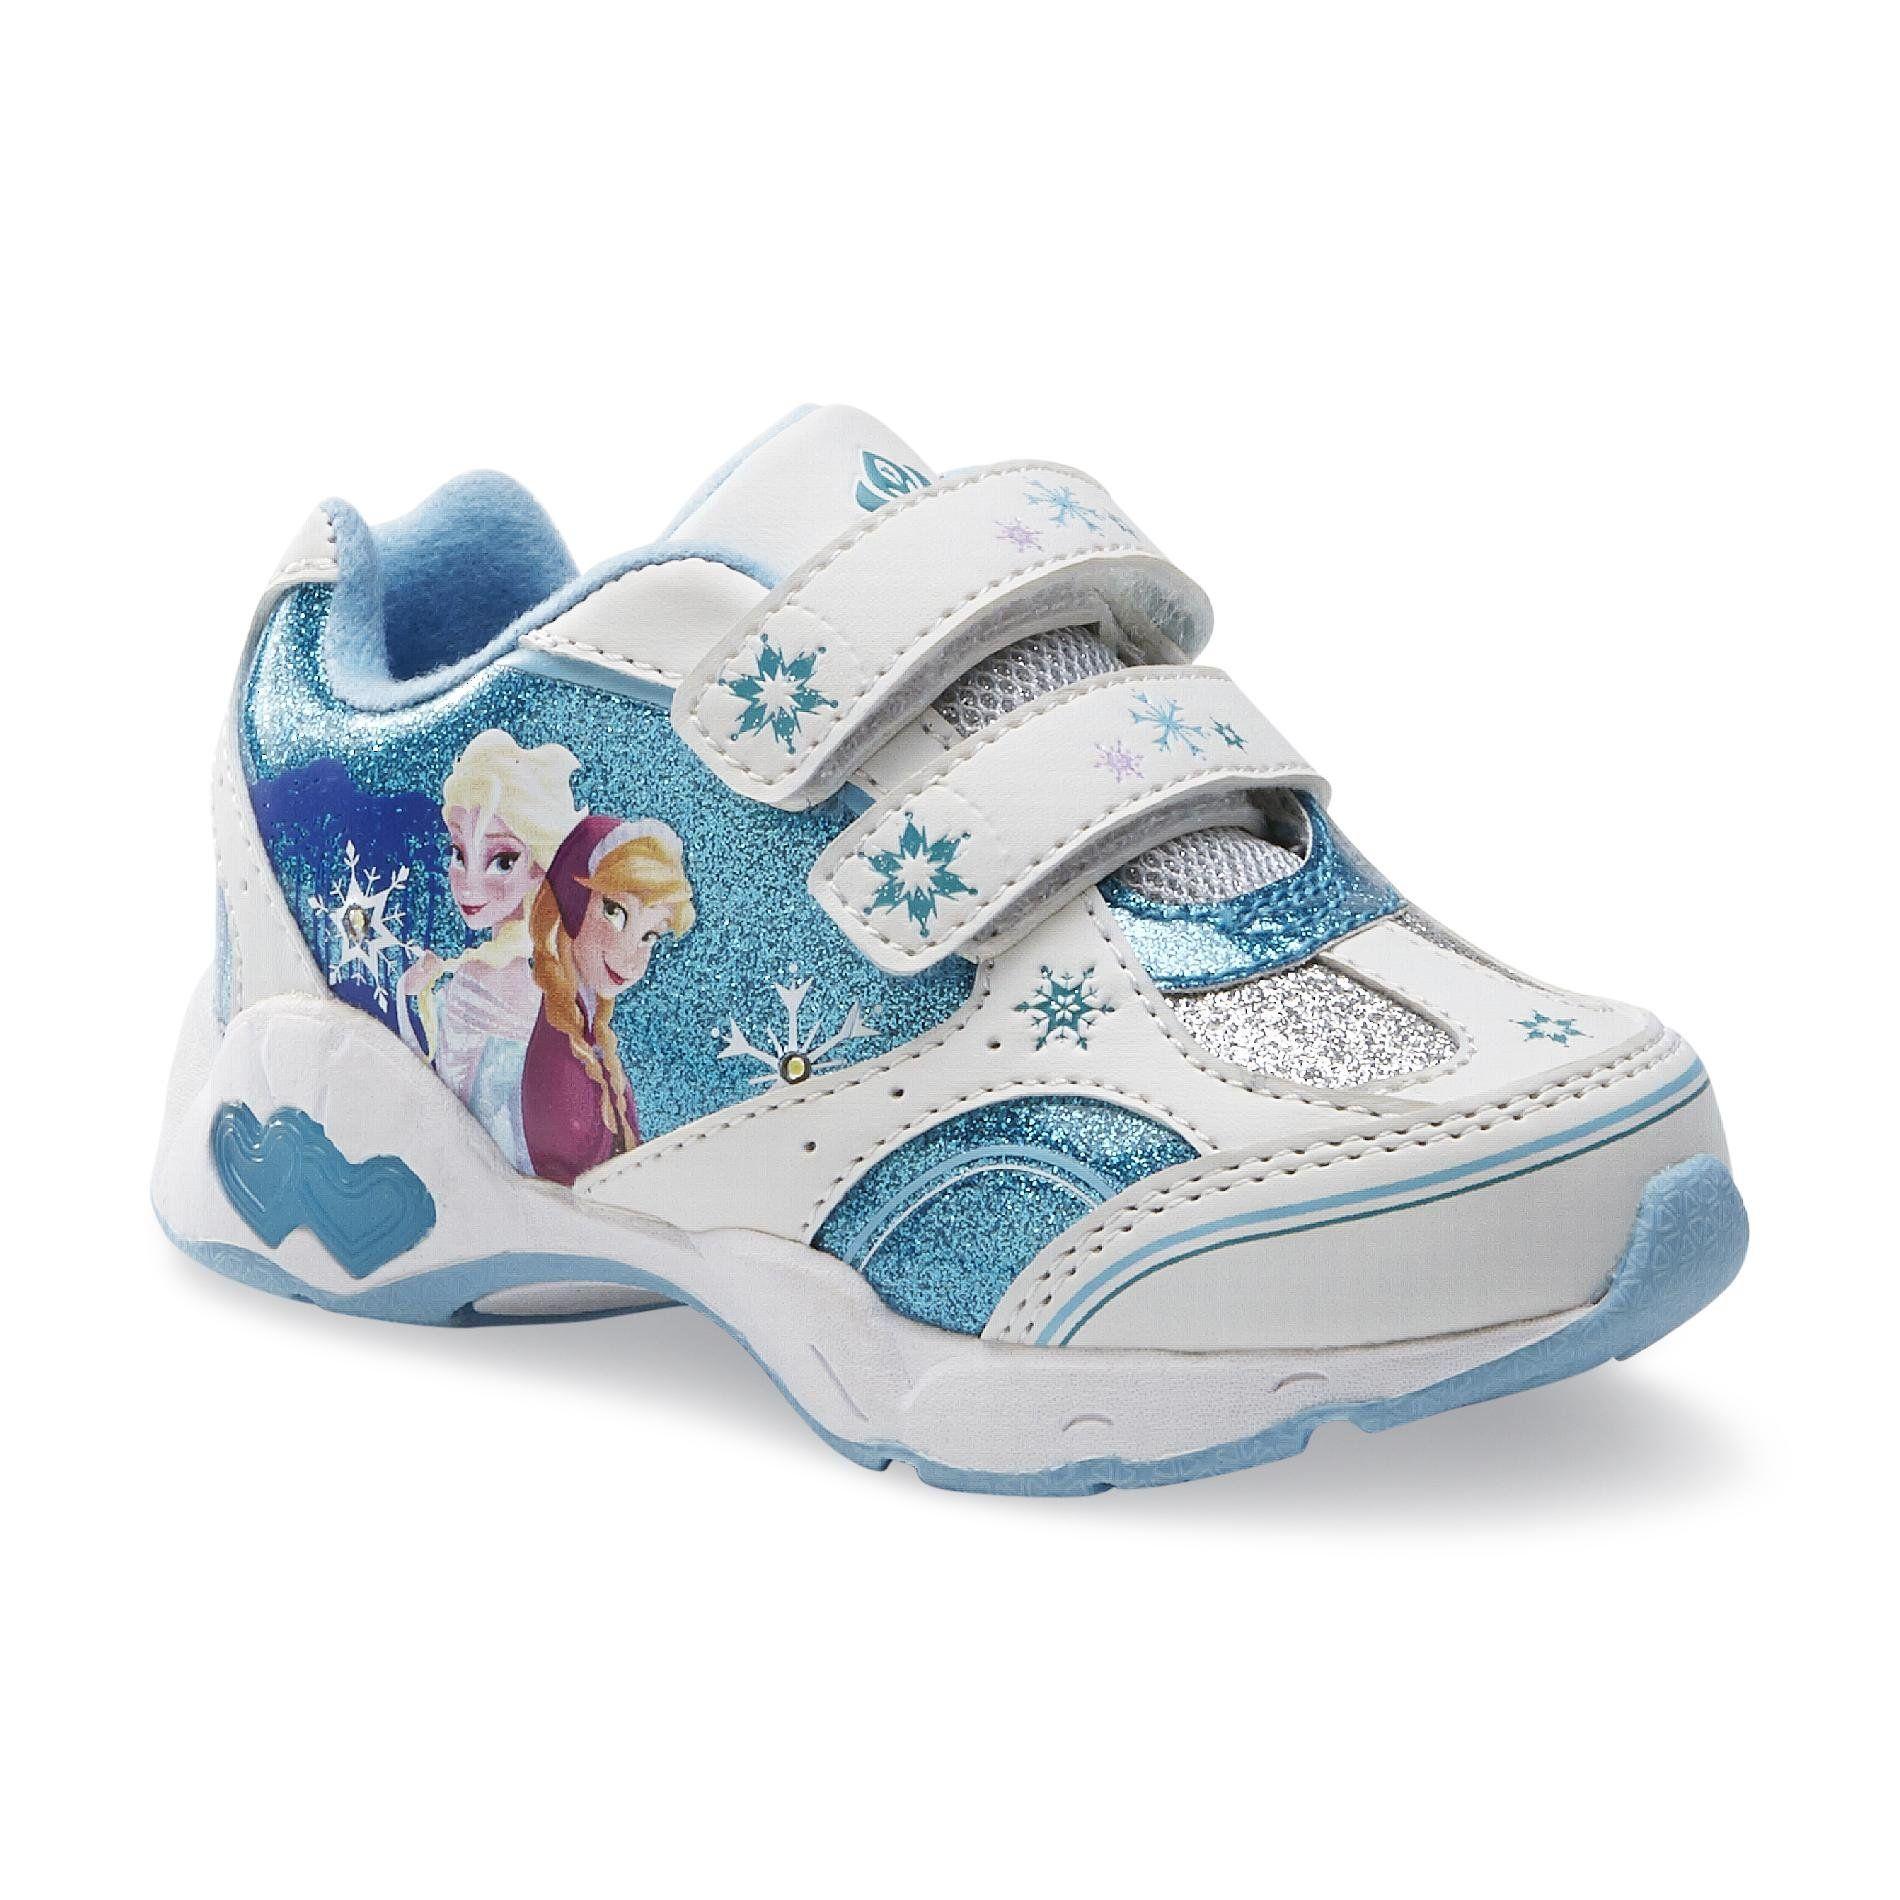 Disney Frozen Toddler Elsa Anna Sneakers Light-Up Lights Athletic Kids Shoes  Blue White